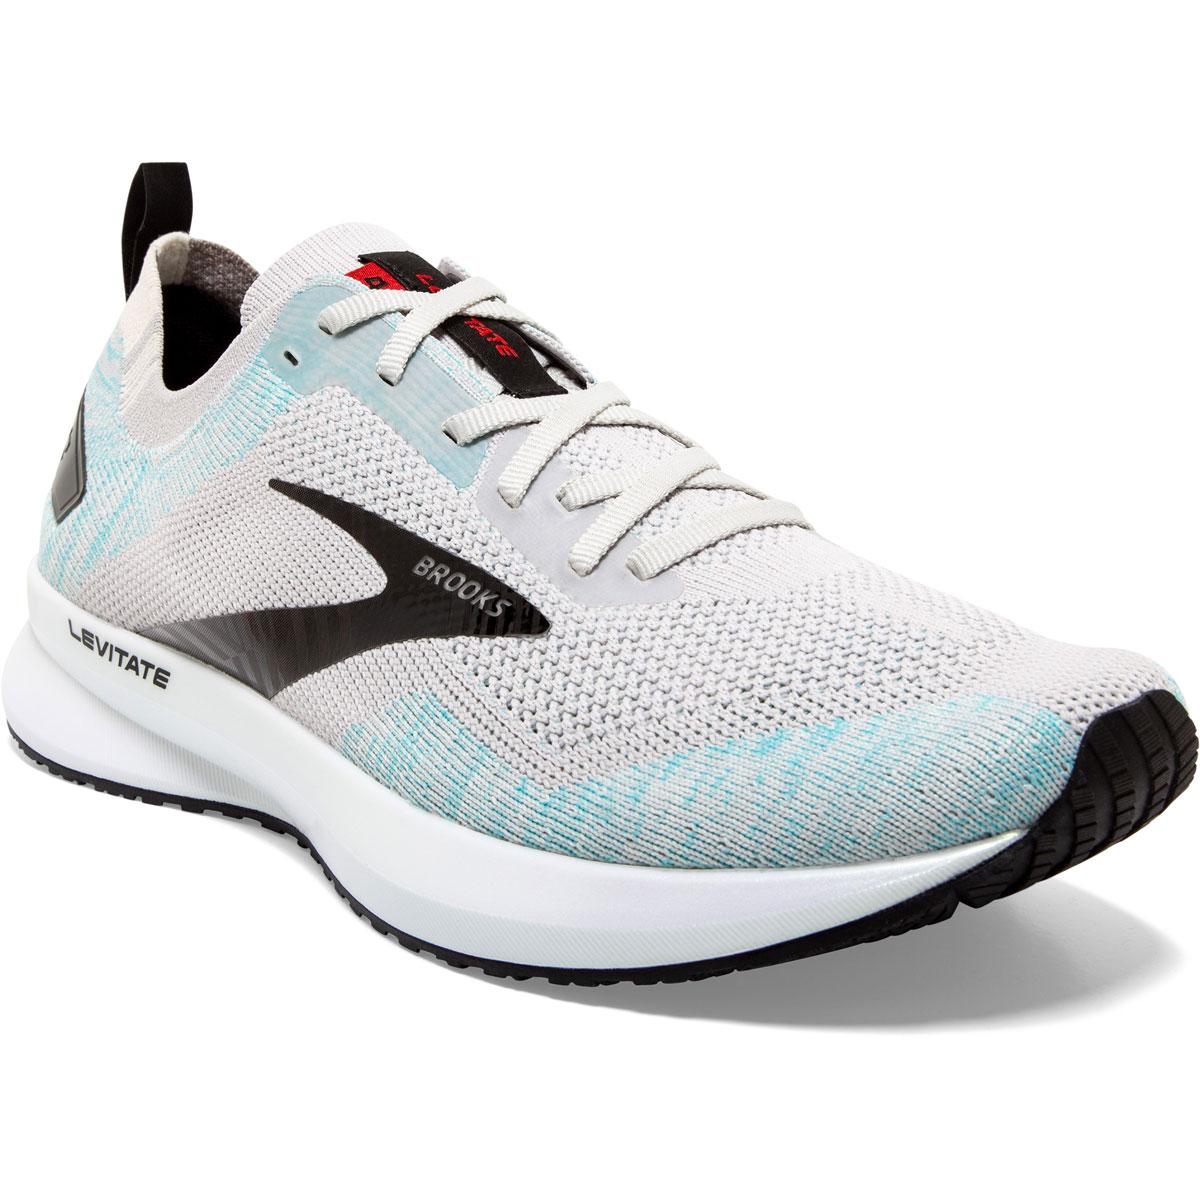 Men's Brooks Levitate 4 Running Shoe - Color: Grey/Black/Capri - Size: 8 - Width: Regular, Grey/Black/Capri, large, image 2